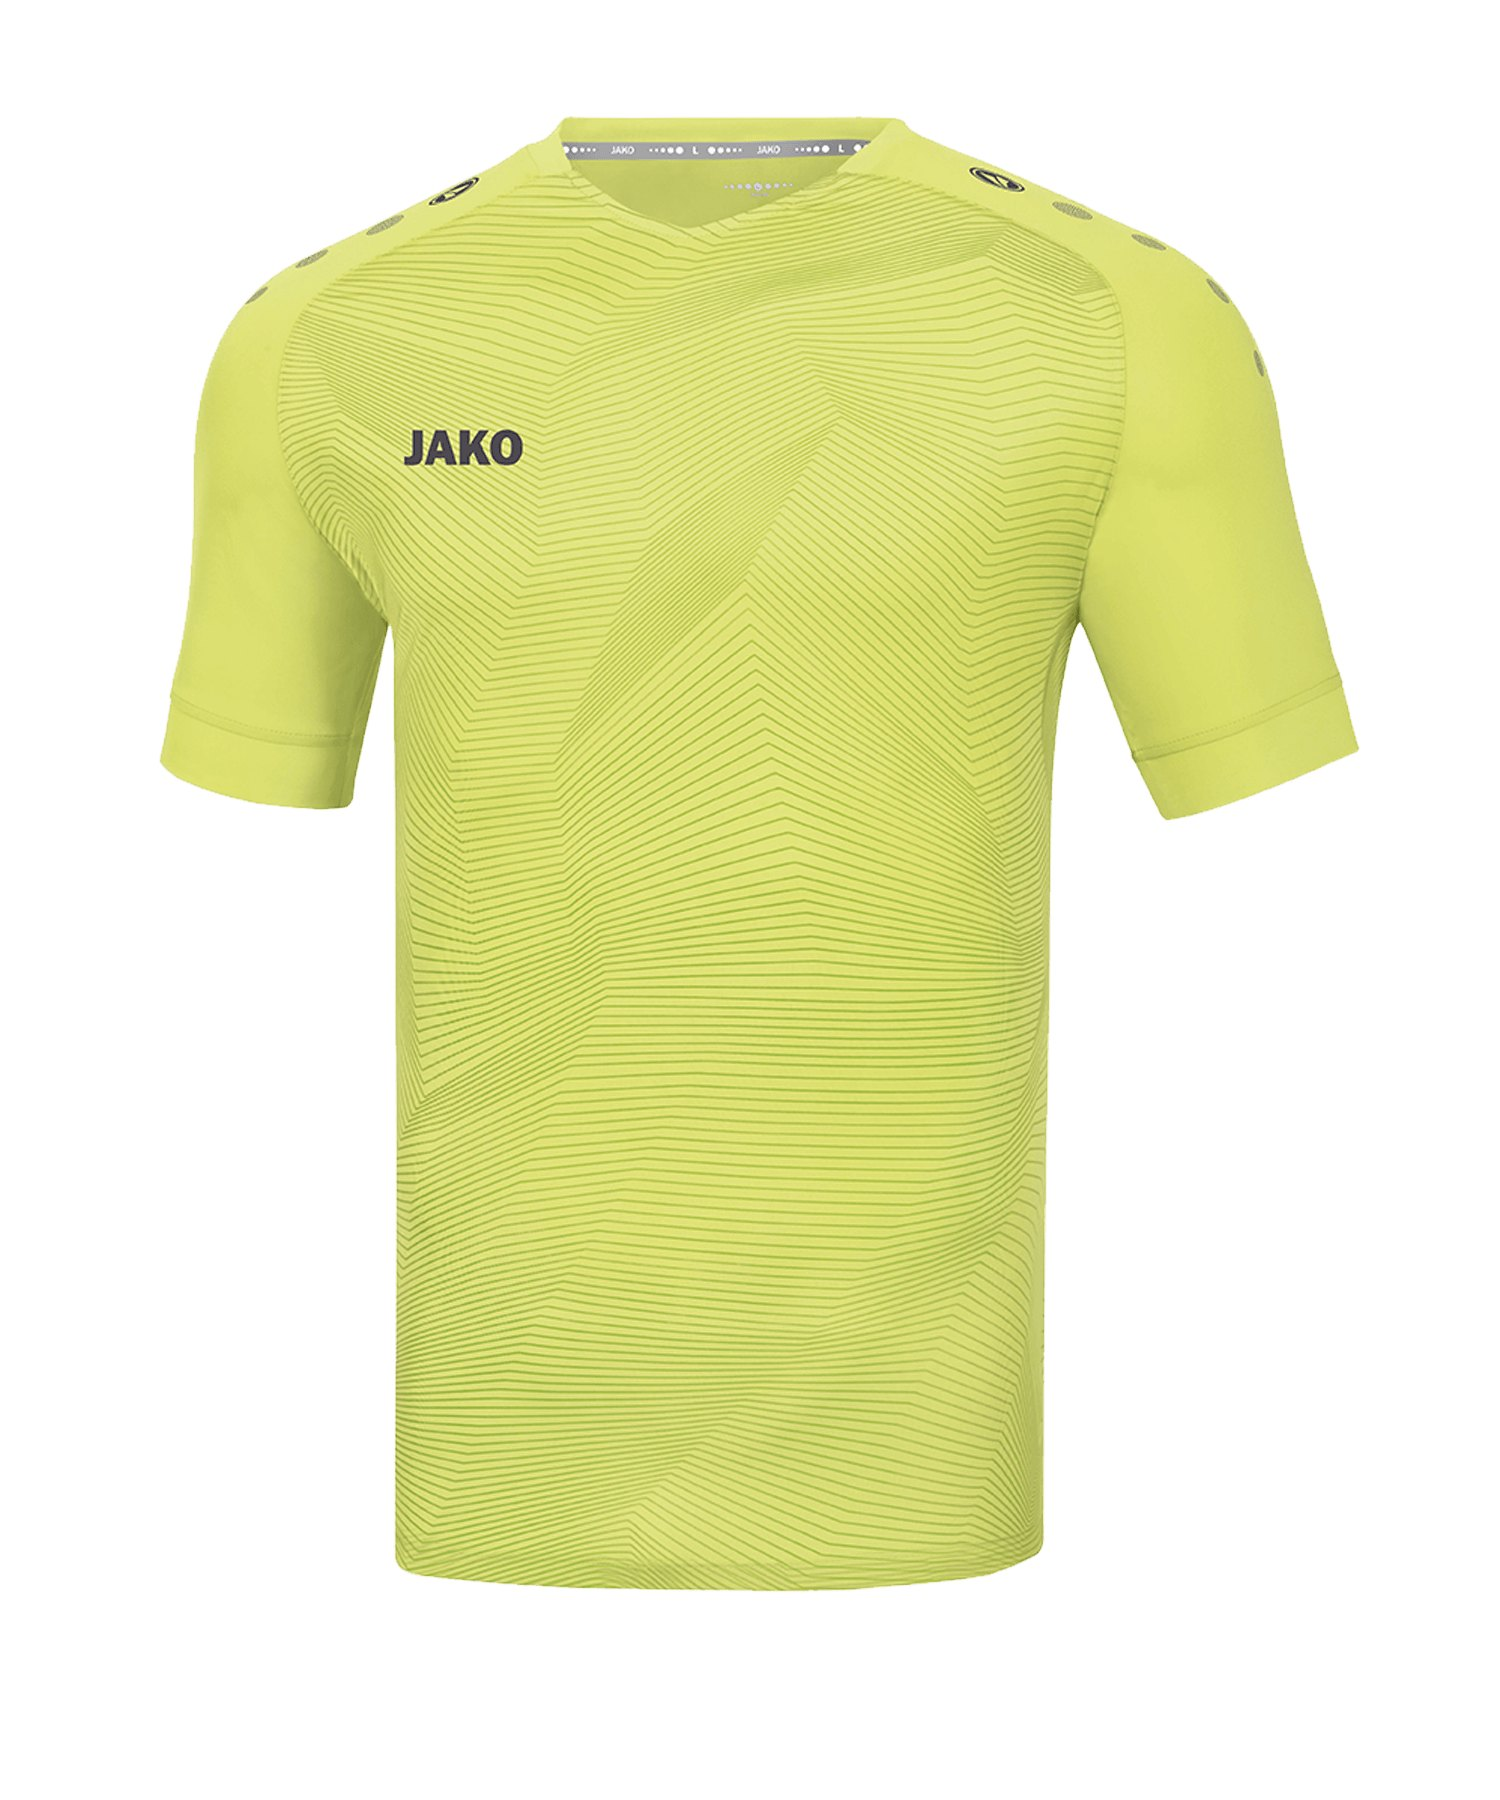 JAKO Premium Trikot kurzarm Gelb F36 - gelb